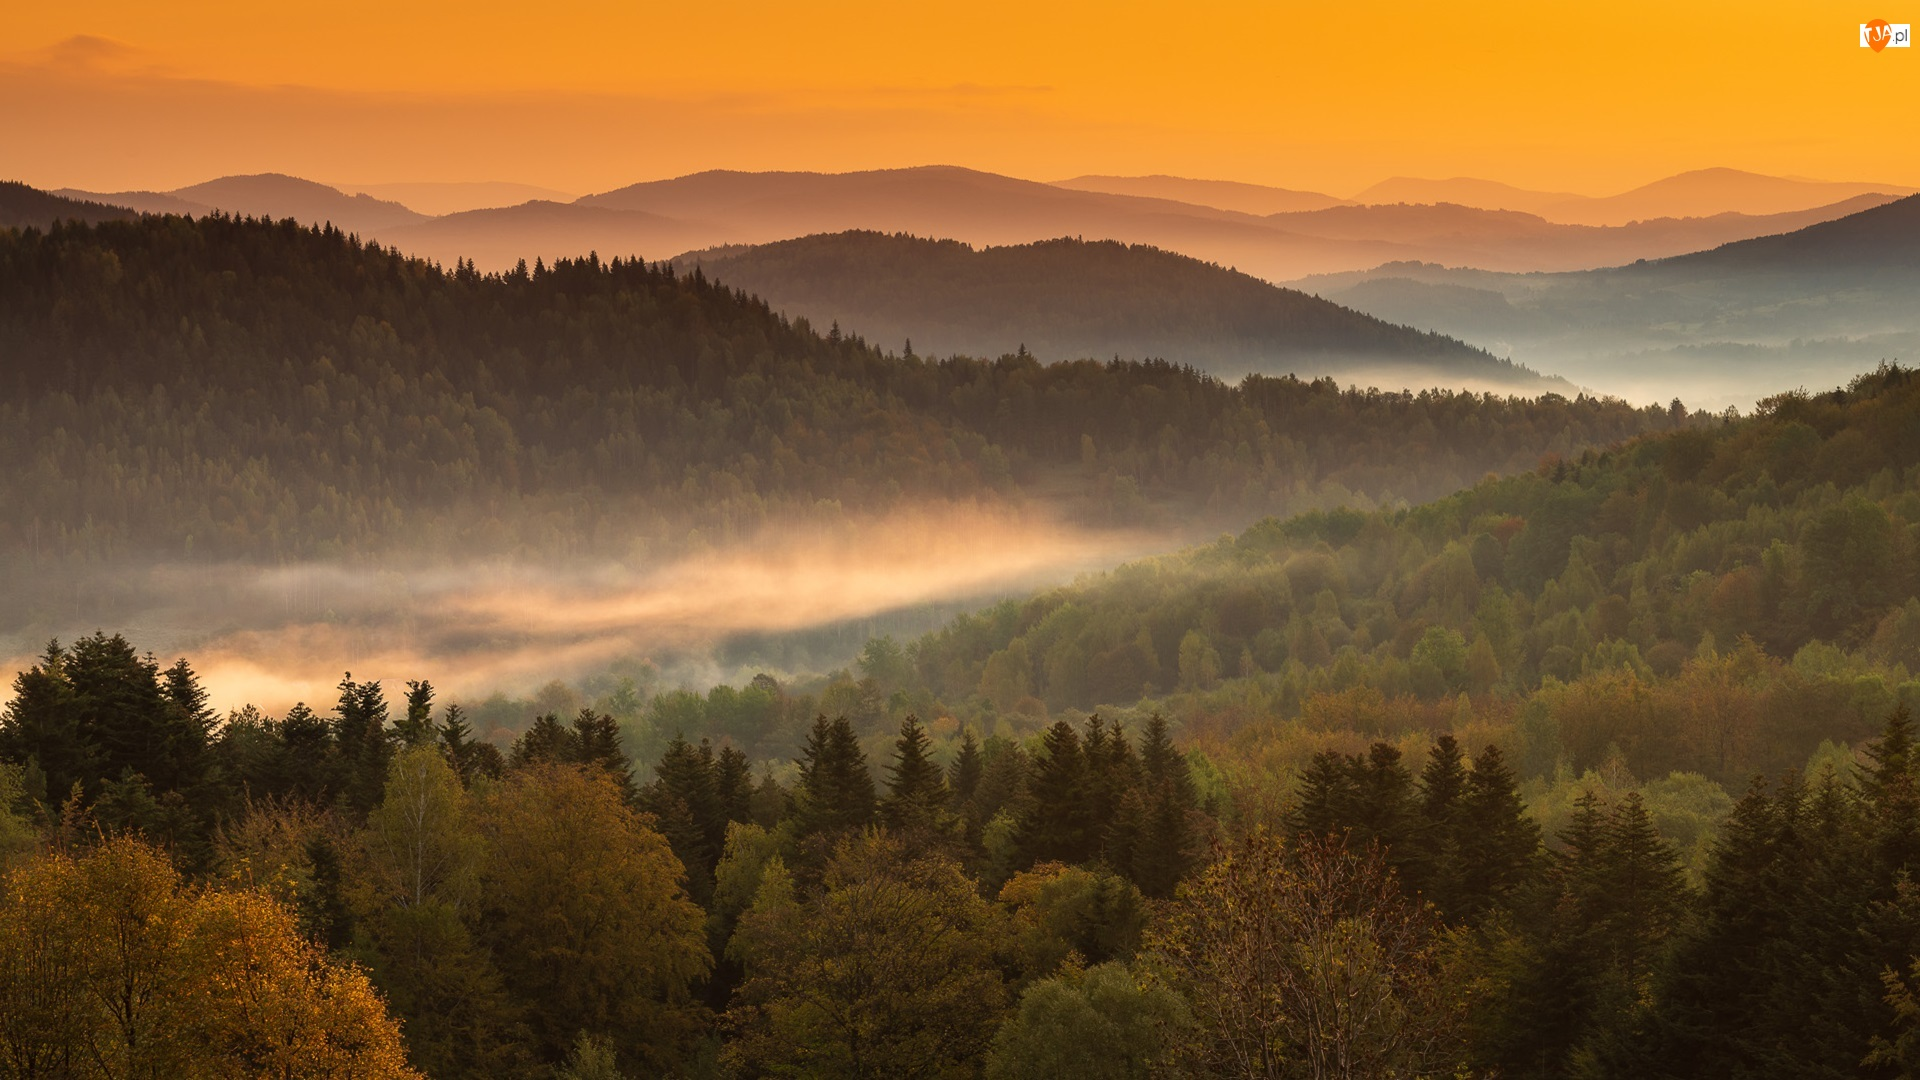 Mgła, Góry, Wzgórza, Lasy